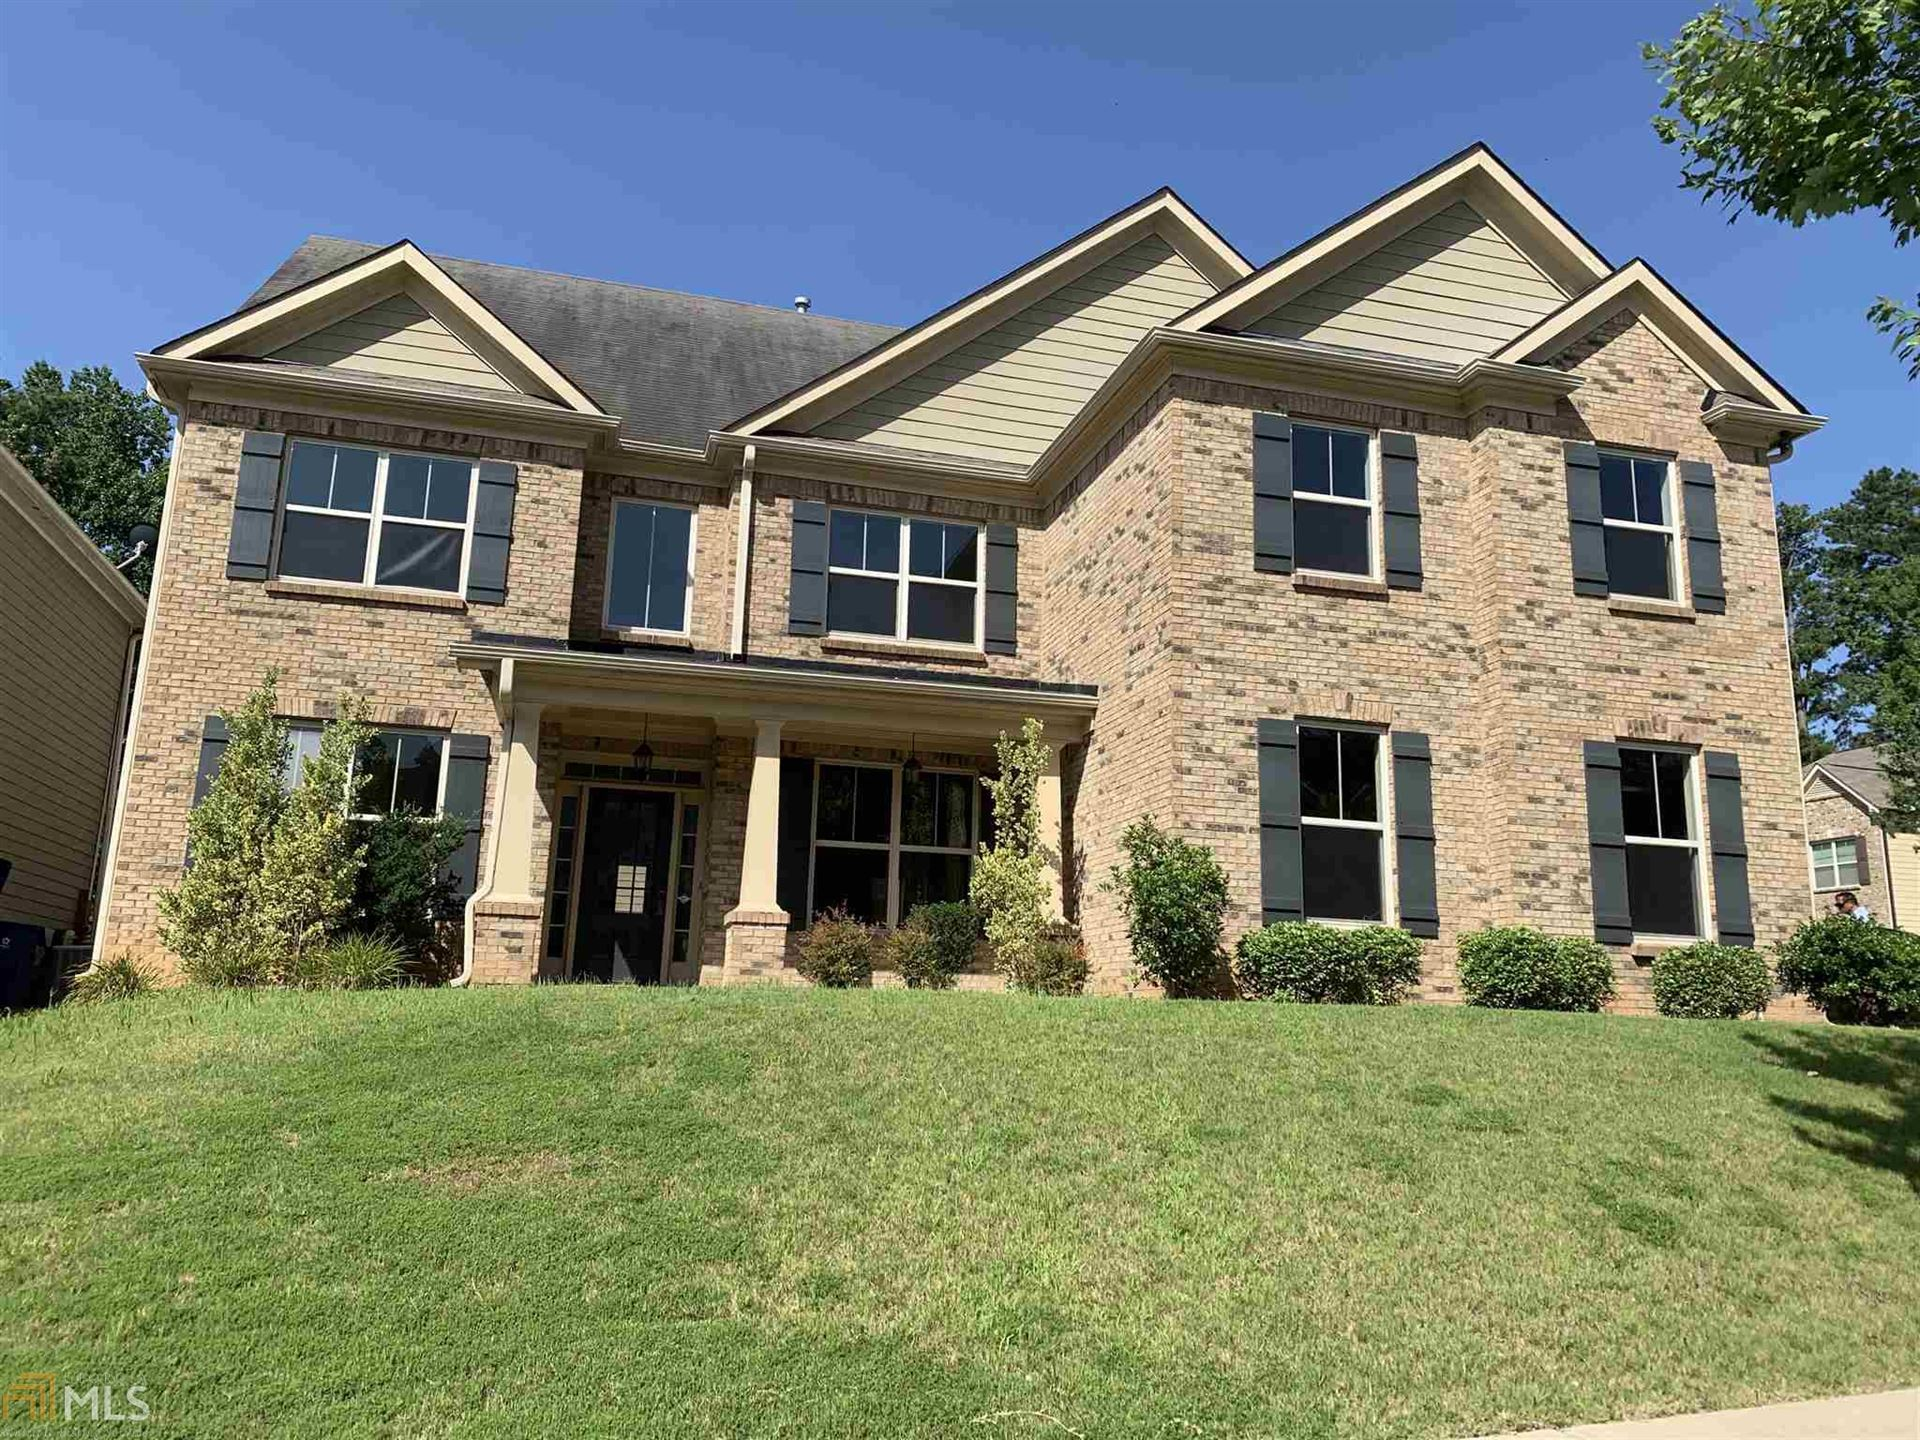 2177 Roberts View Trl, Buford, GA 30519 - #: 8778447